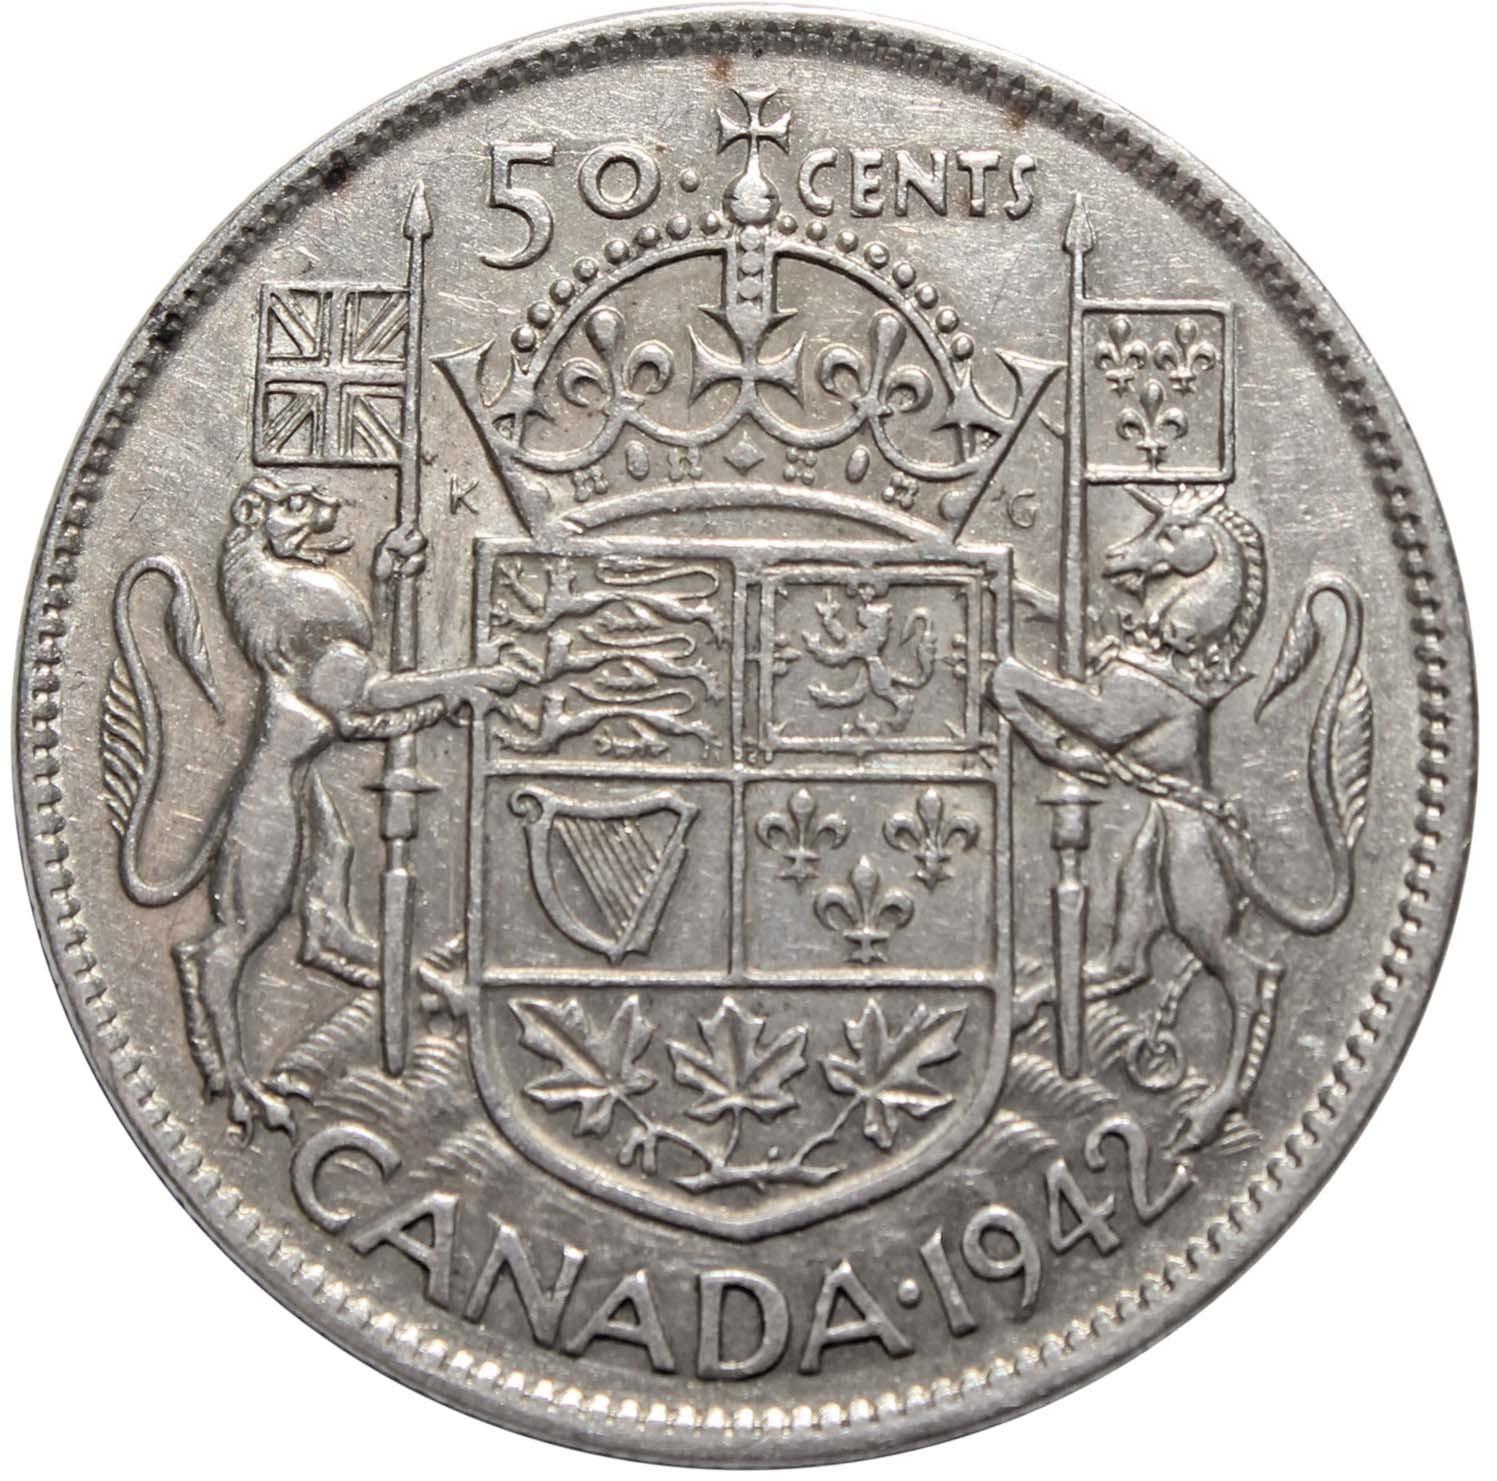 50 центов. Канада. Серебро. 1942 год. VF-XF